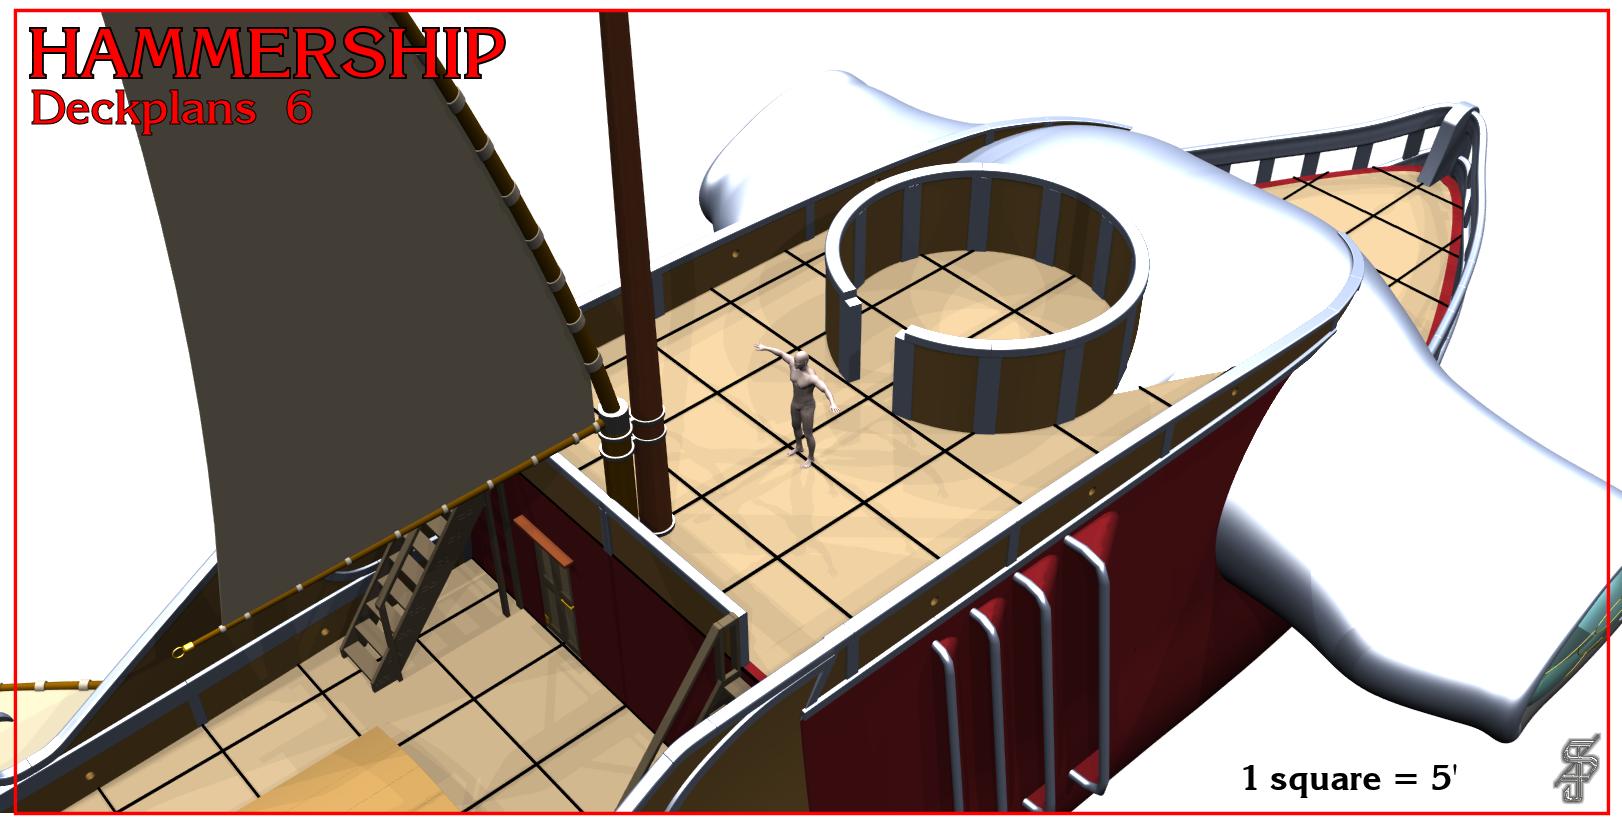 Hammership layout 6